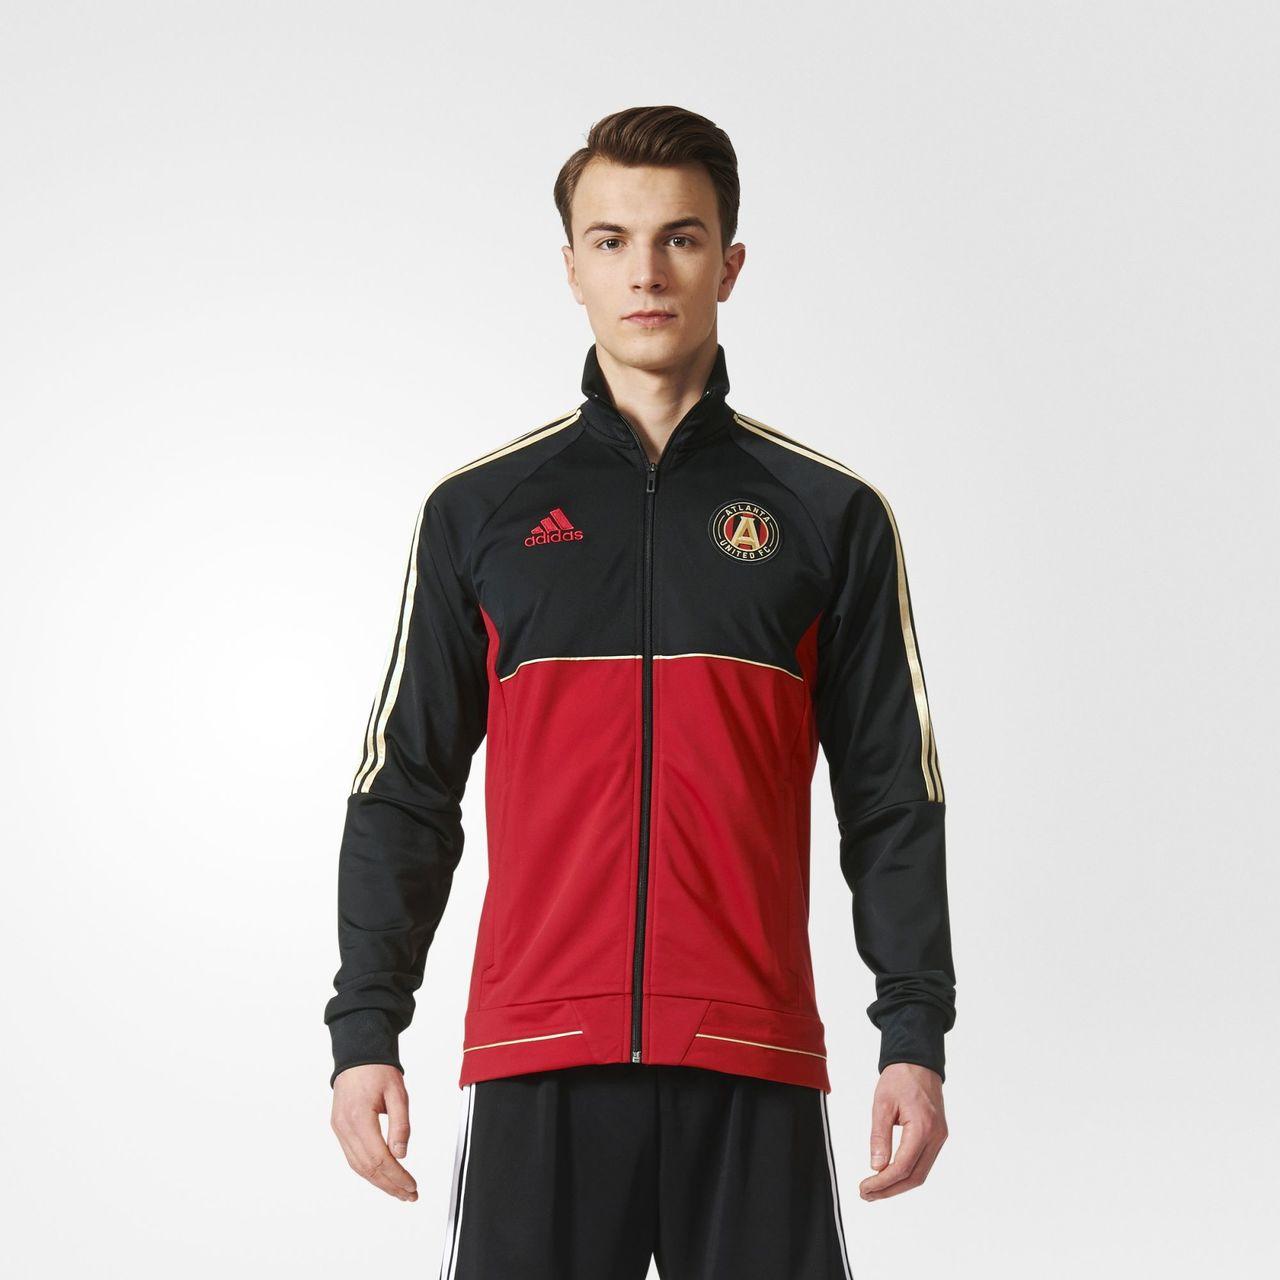 82a5c5e8b ... Click to enlarge image  atlanta_united_2017_adidas_anthem_jacket_black_victory_red_light_football_gold_c.jpg  ...